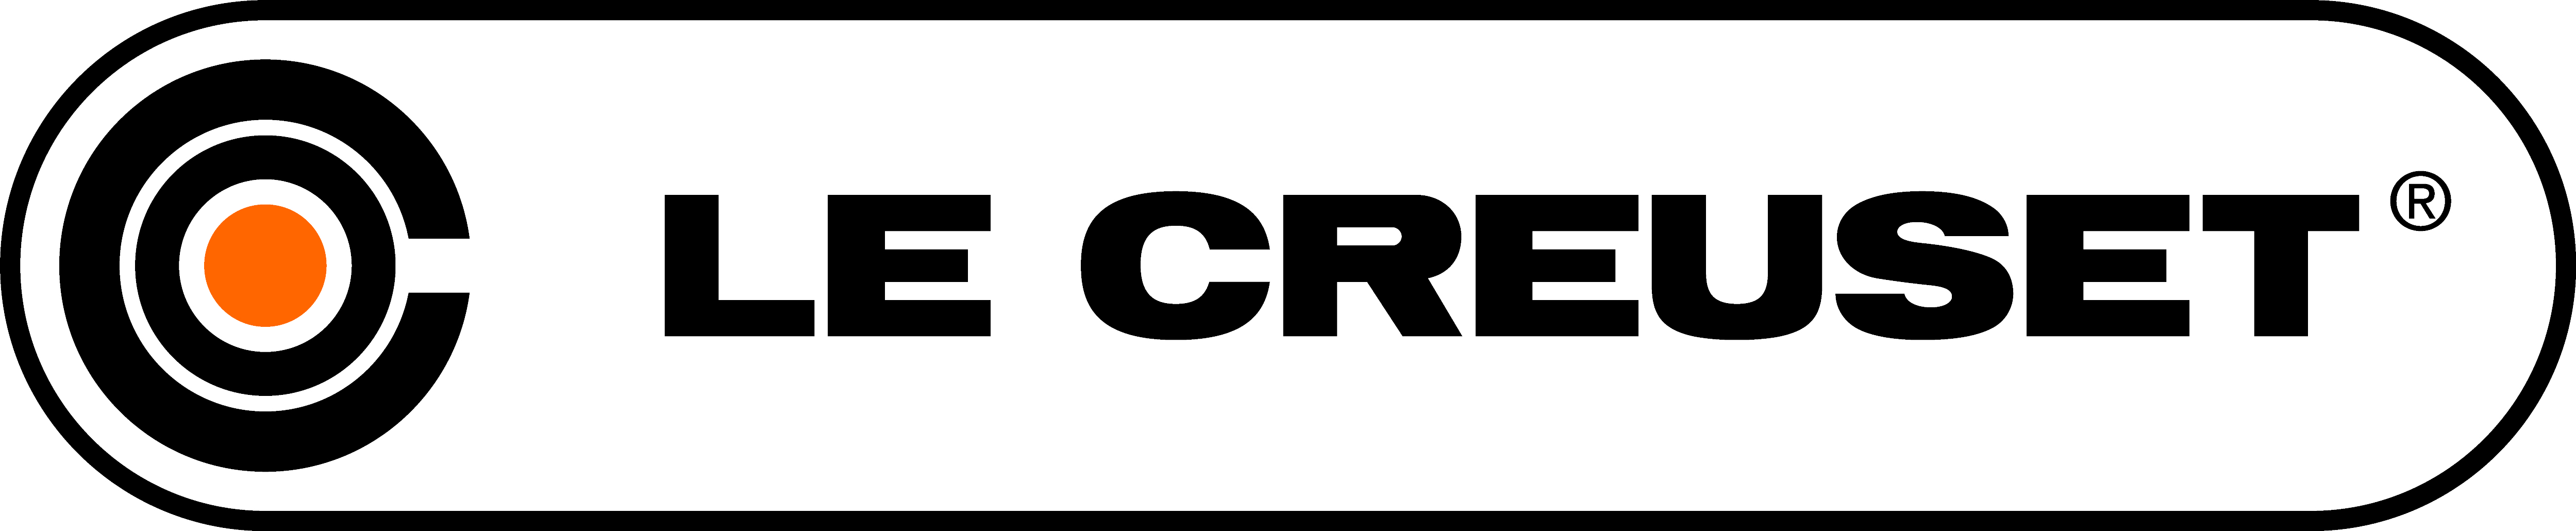 le_creuset_logo_17